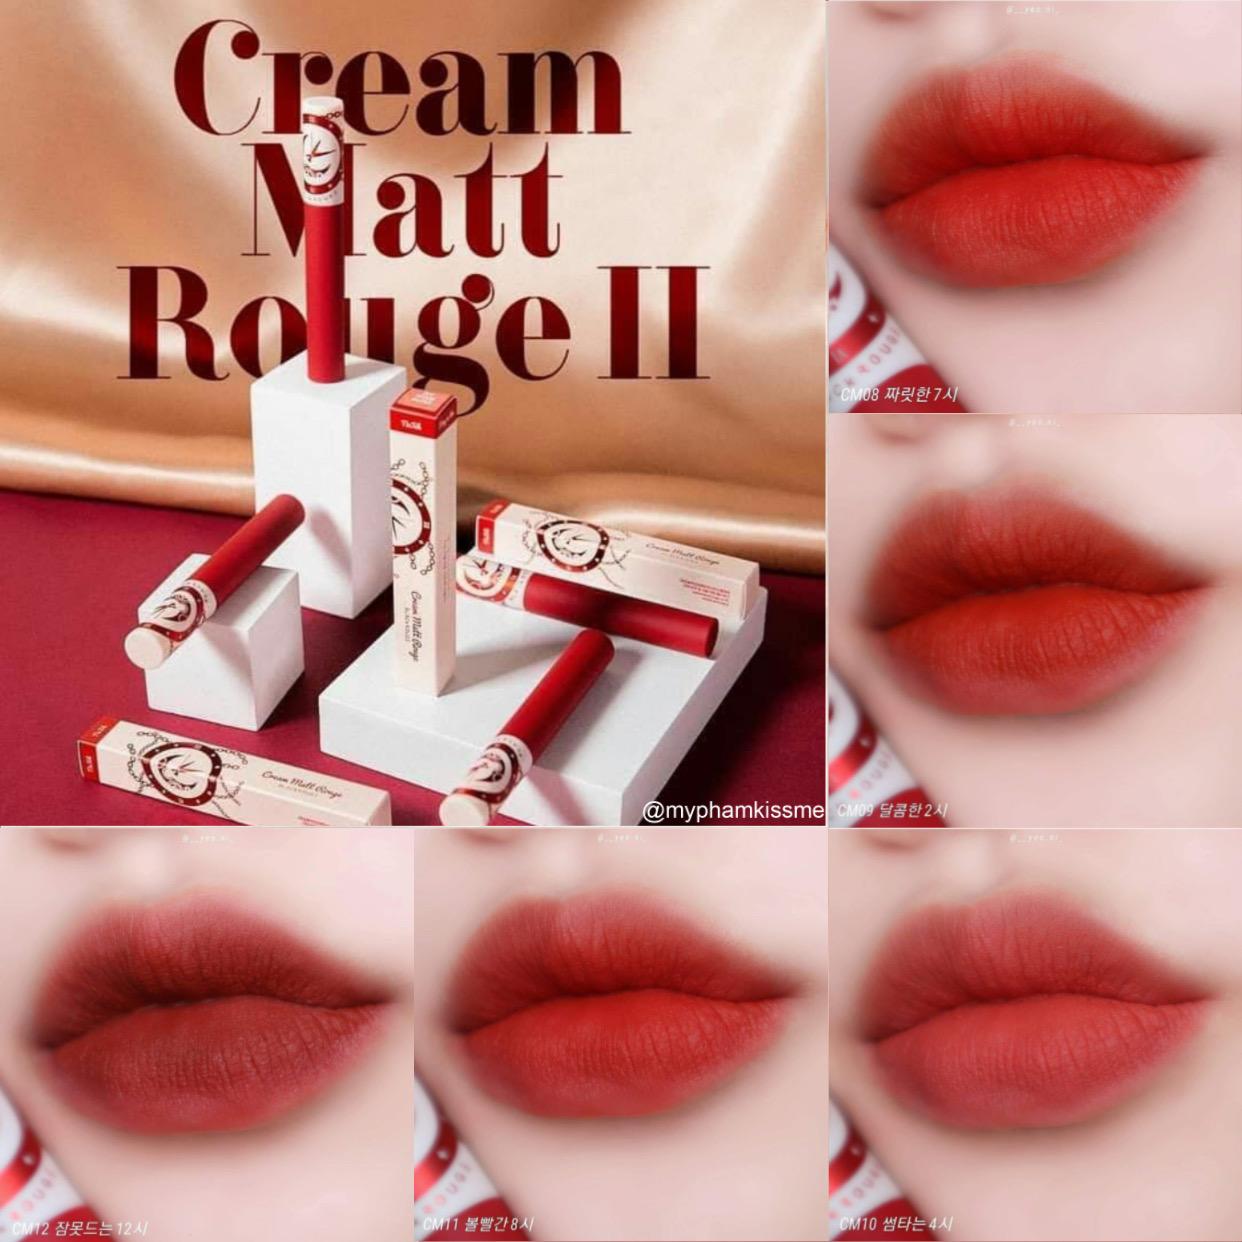 Son kem Black Rouge Cream Matt Rouge II